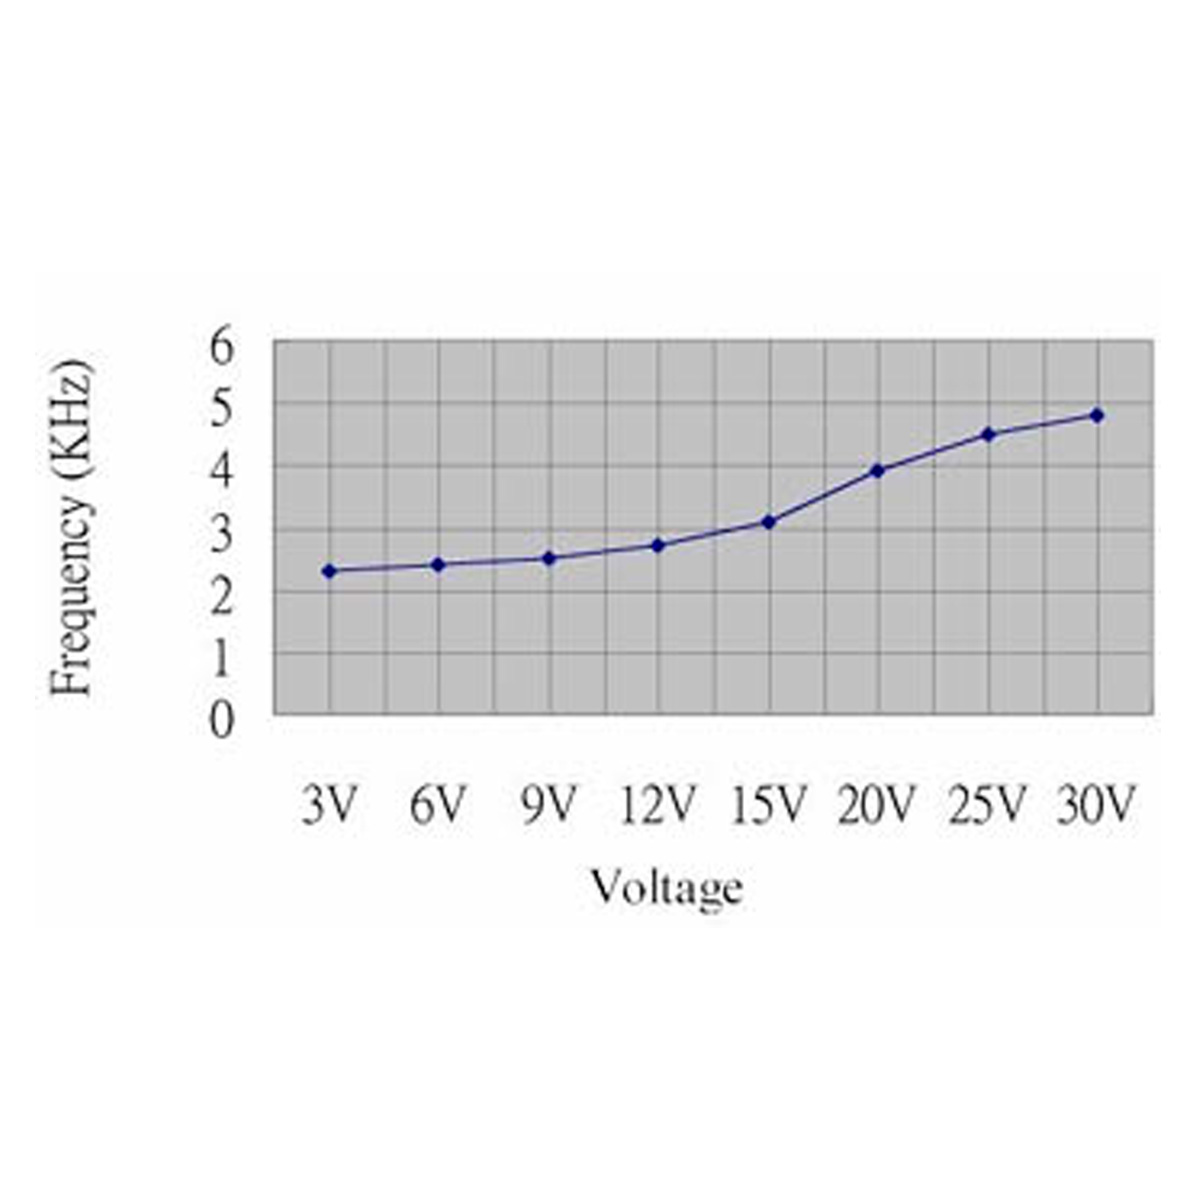 Circuito Zumbador Piezoelectrico : Zumbador piezoelectrico vcc